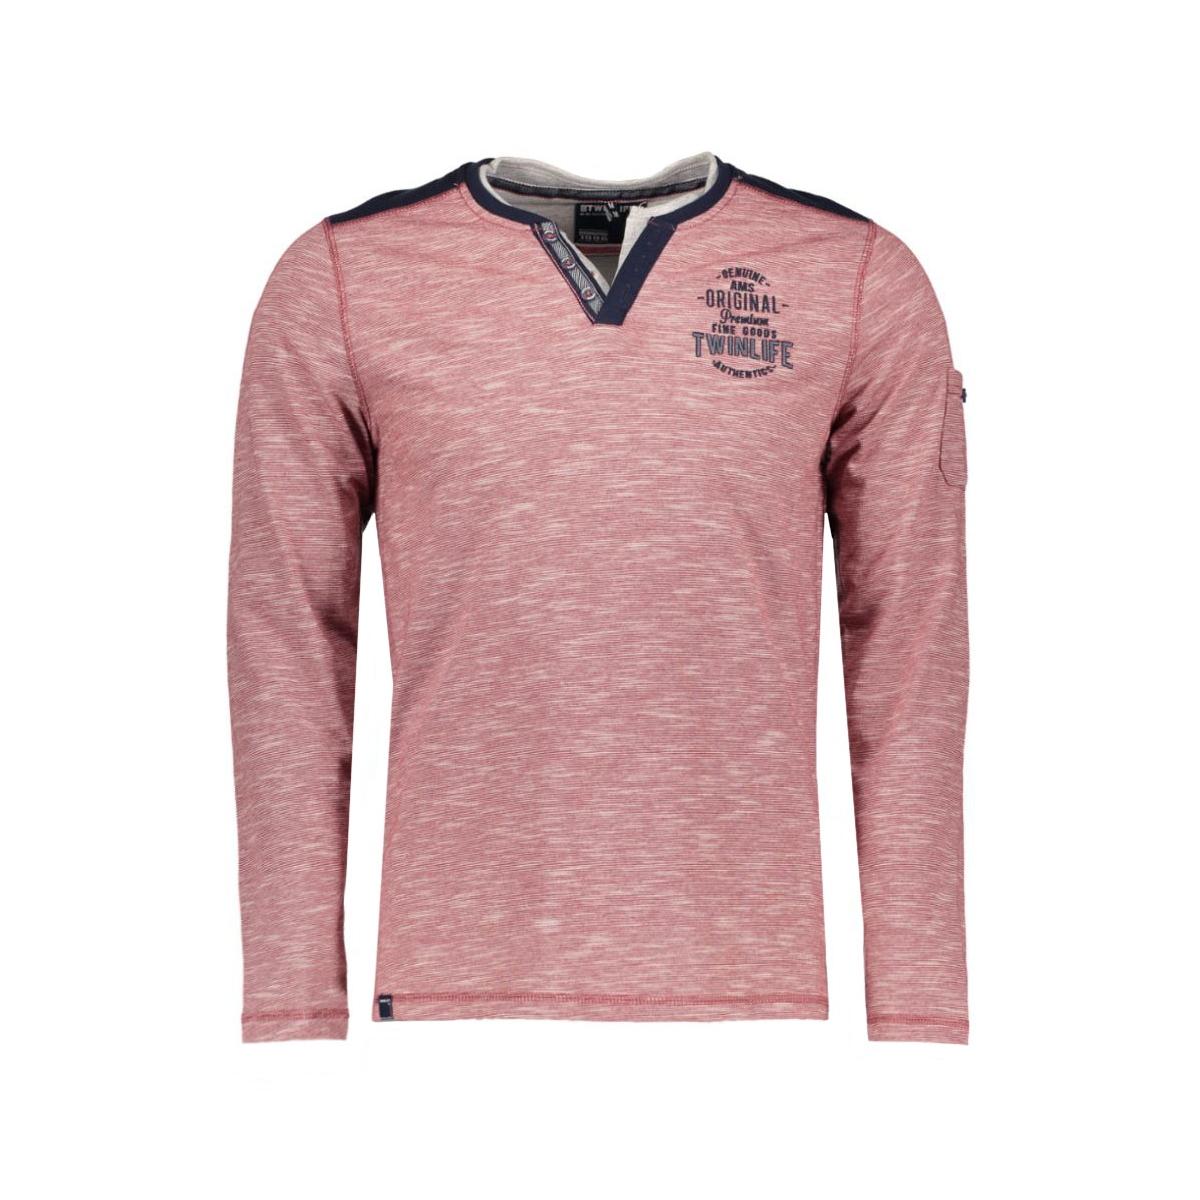 mls651817 twinlife t-shirt 4504